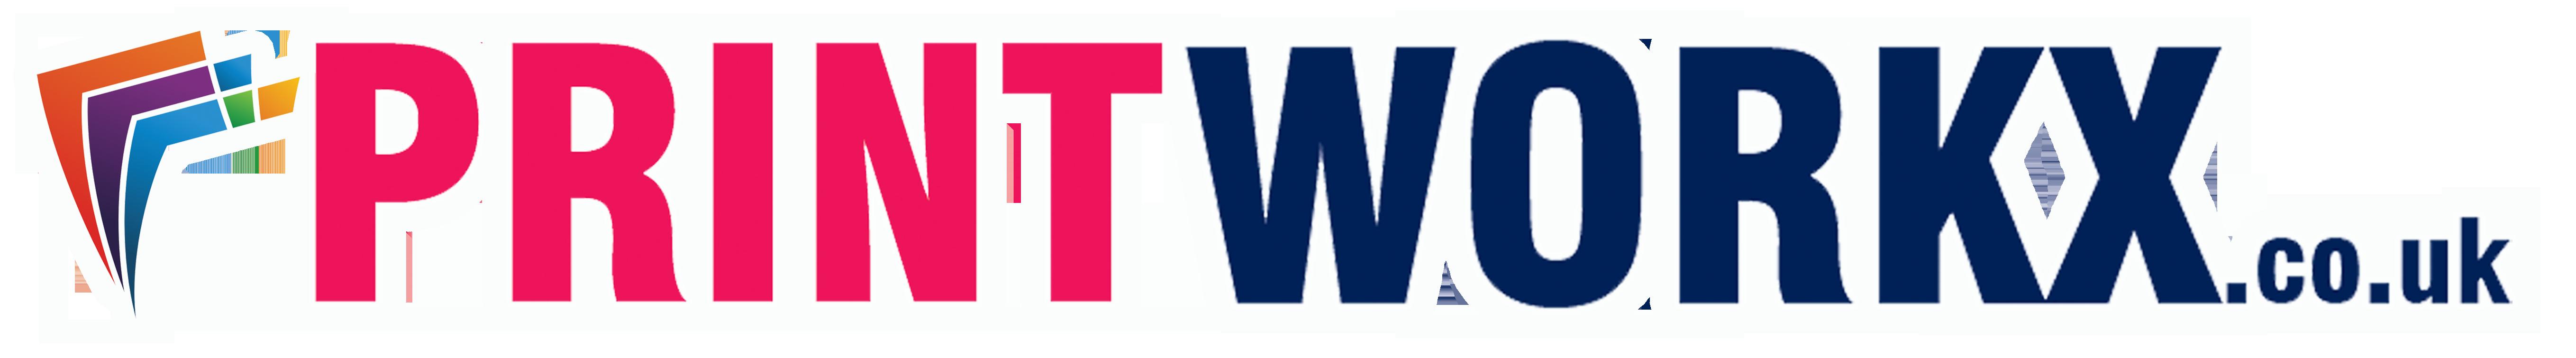 logoPrintworkx